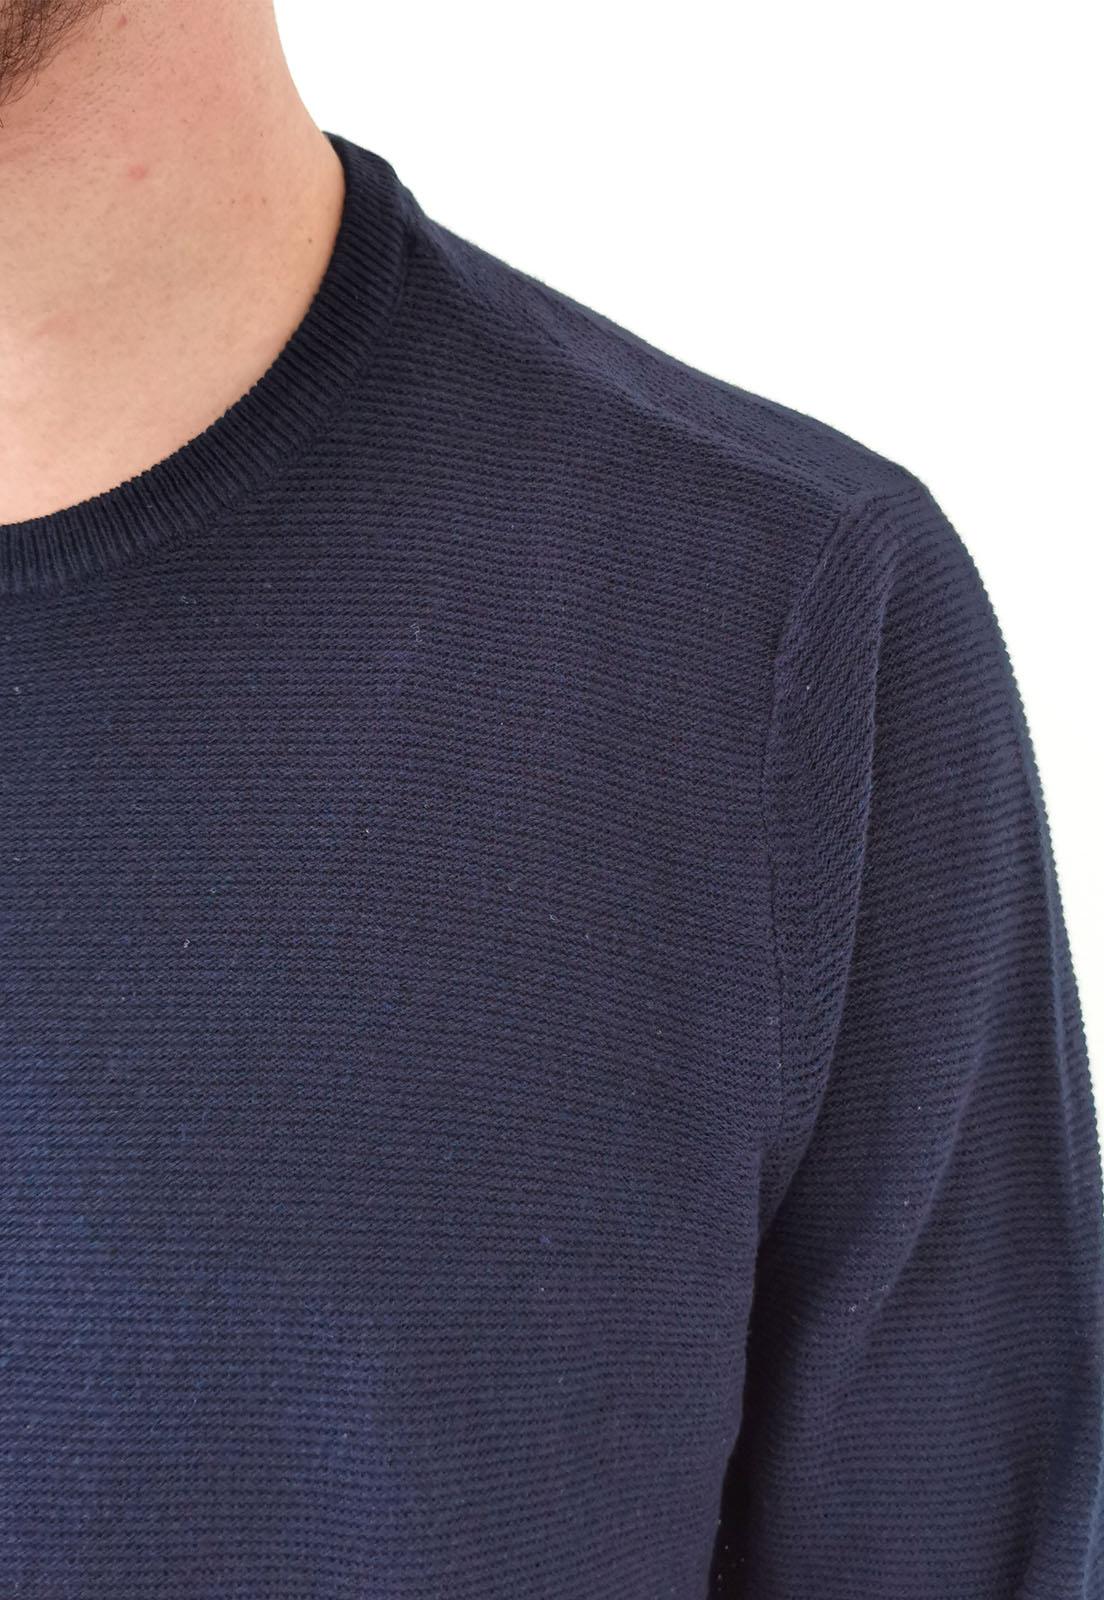 Blusa Hering Azul Marinho